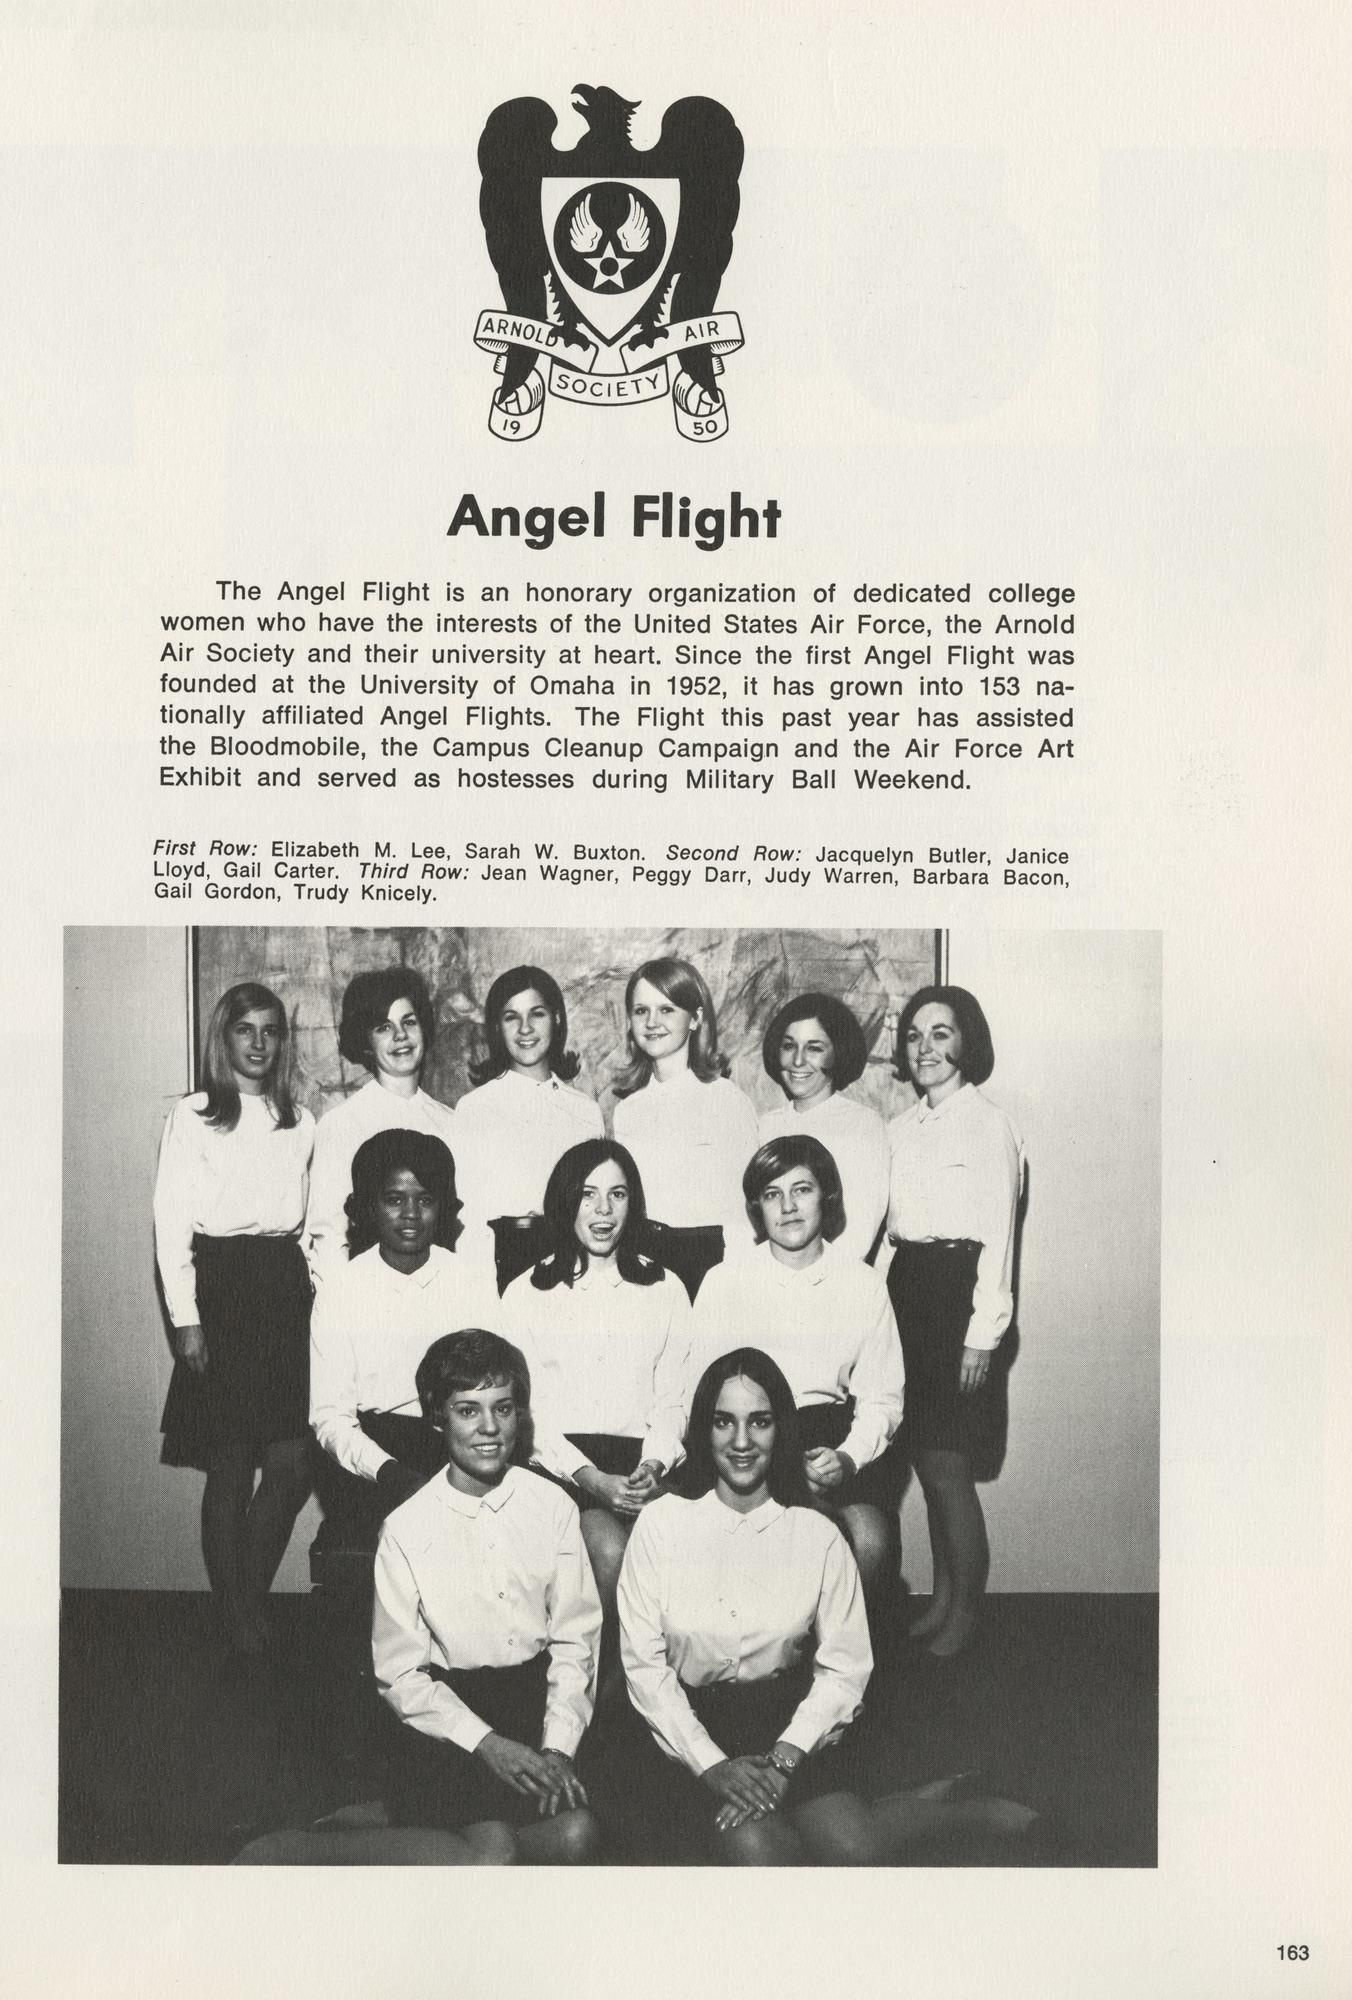 http://spec.lib.vt.edu/pickup/Omeka_upload/Bugle1969_pg163_AngelFlight.jpg